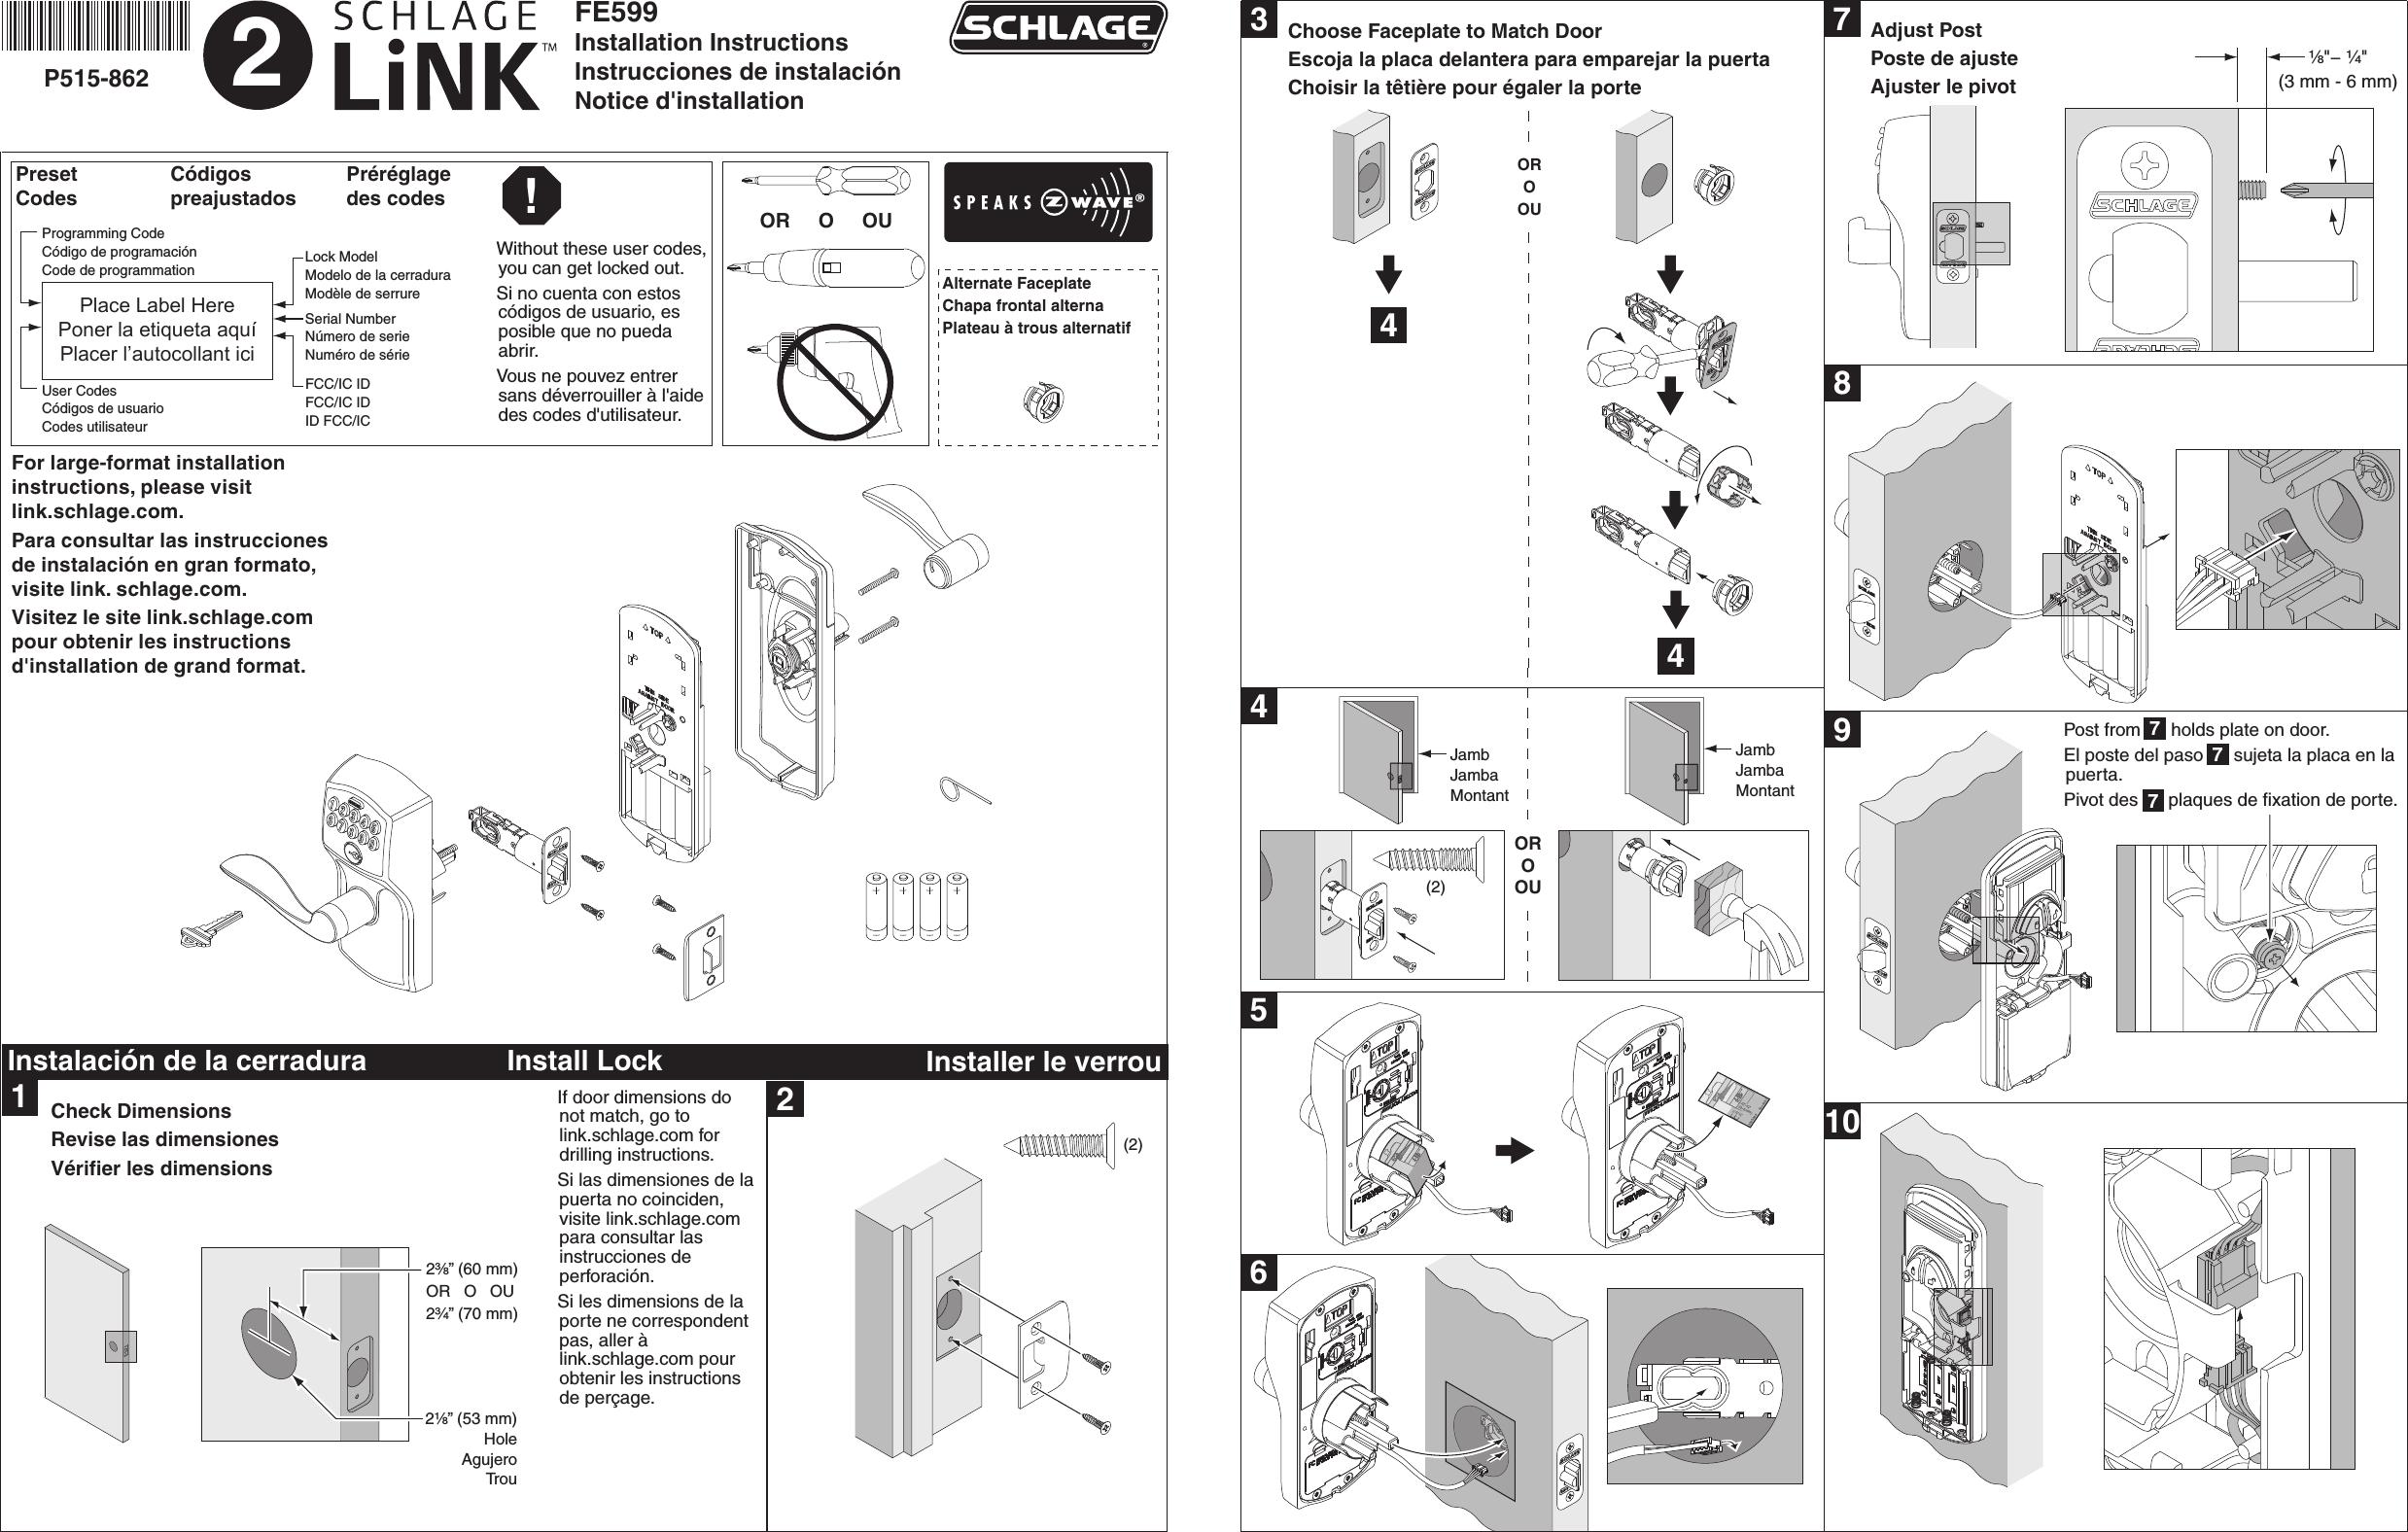 Schlage Electronic Security Fe599 Door Lock User Manual